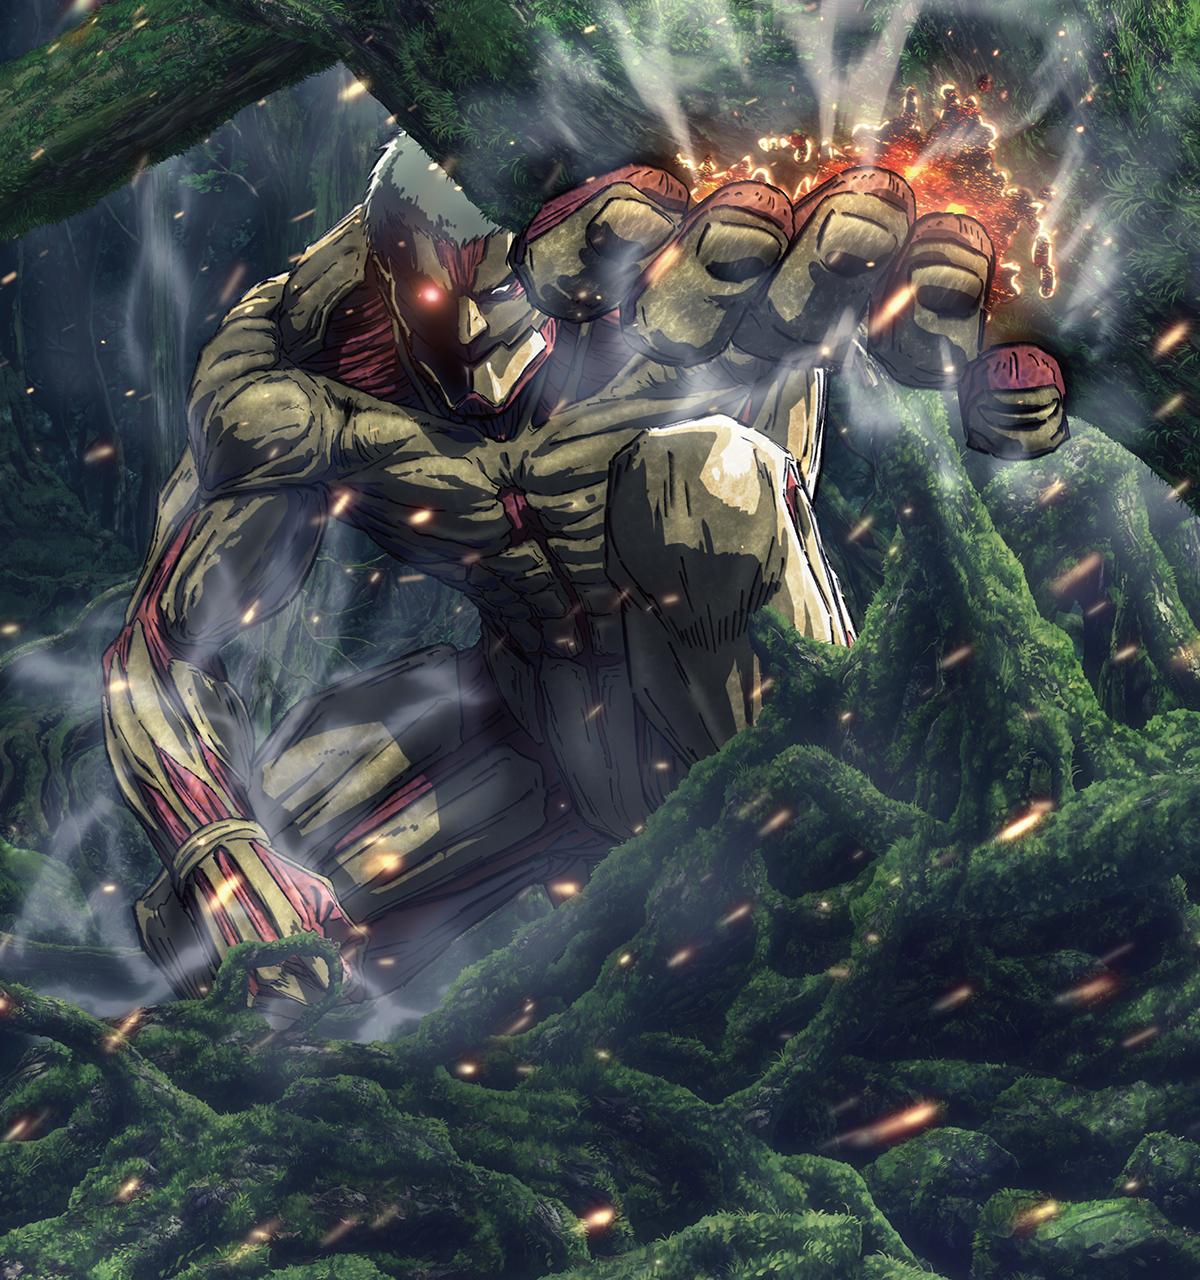 Armored Titan Wallpaper Website By Maxiuchiha22 On Deviantart